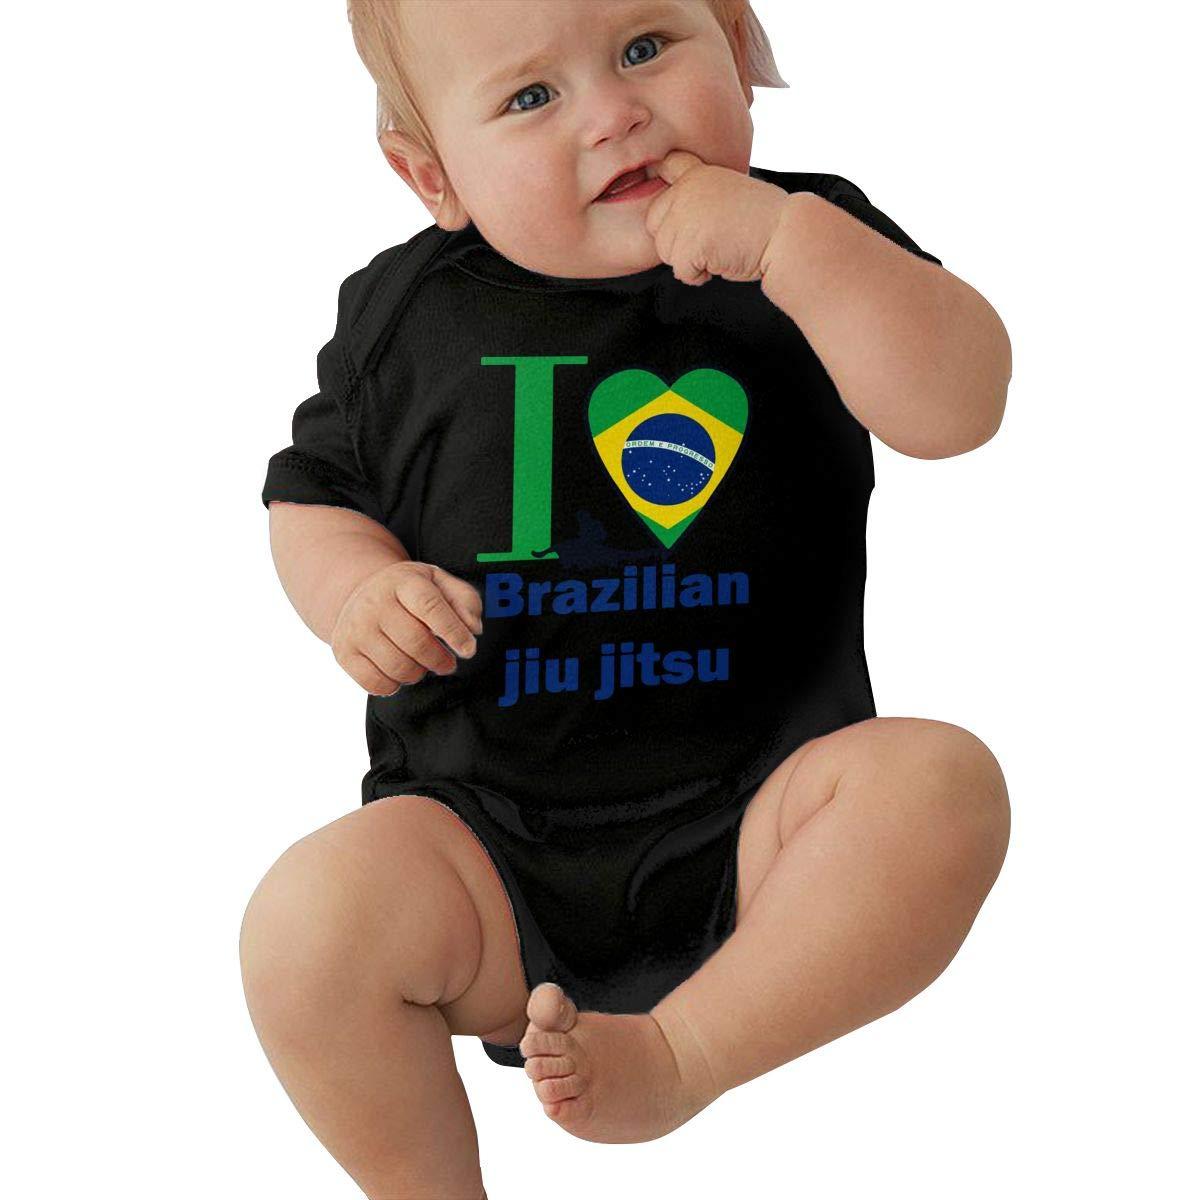 I Love Brazilian Jiu Jitsu Newborn Baby Girl Infant Sleep and Play Short Sleeve Coveralls Jumpsuits